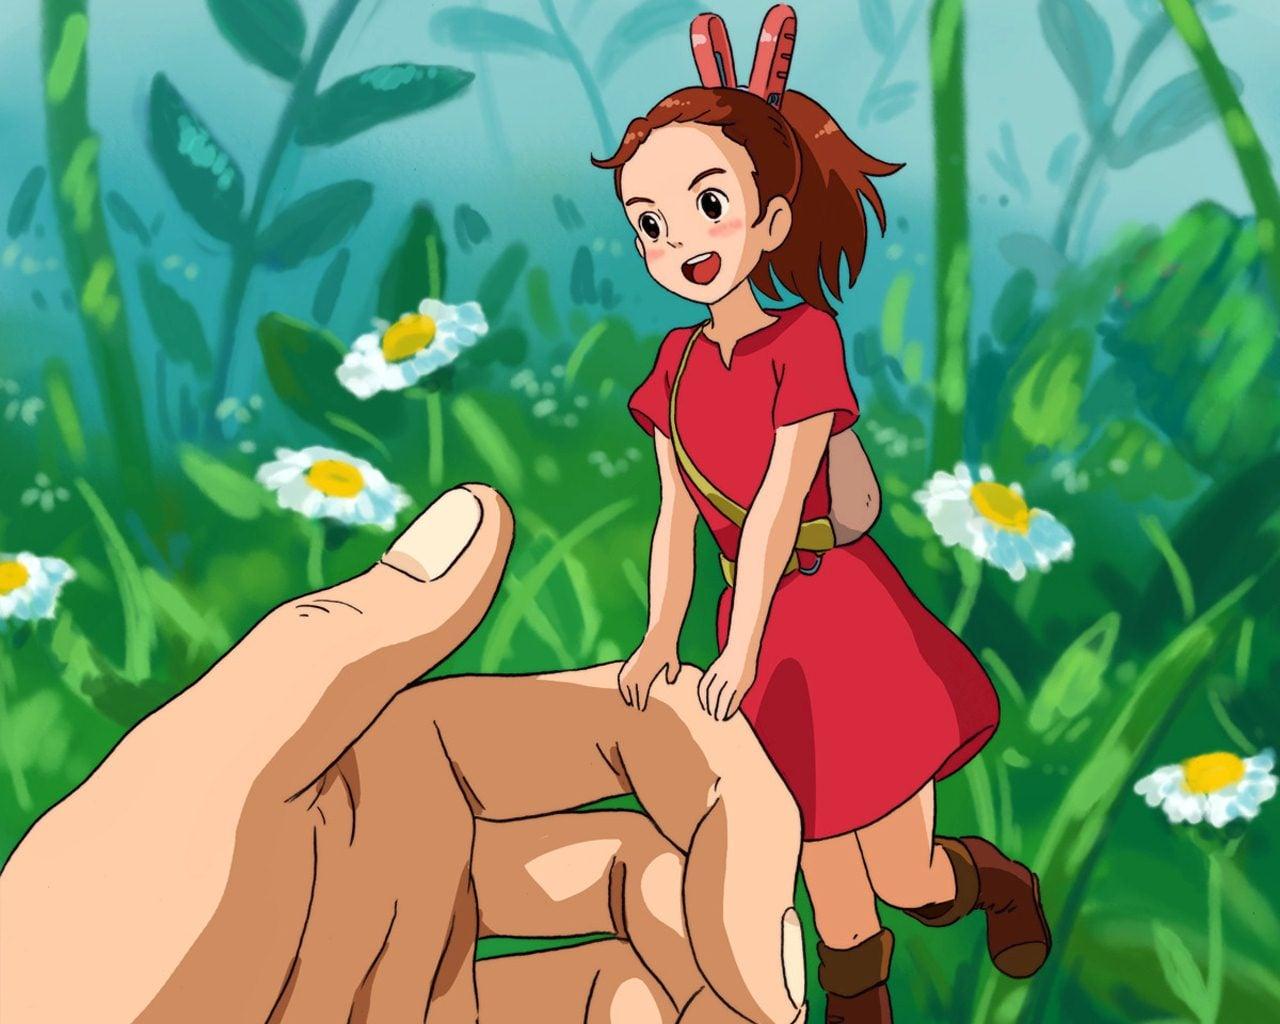 anime, article, and childhood image